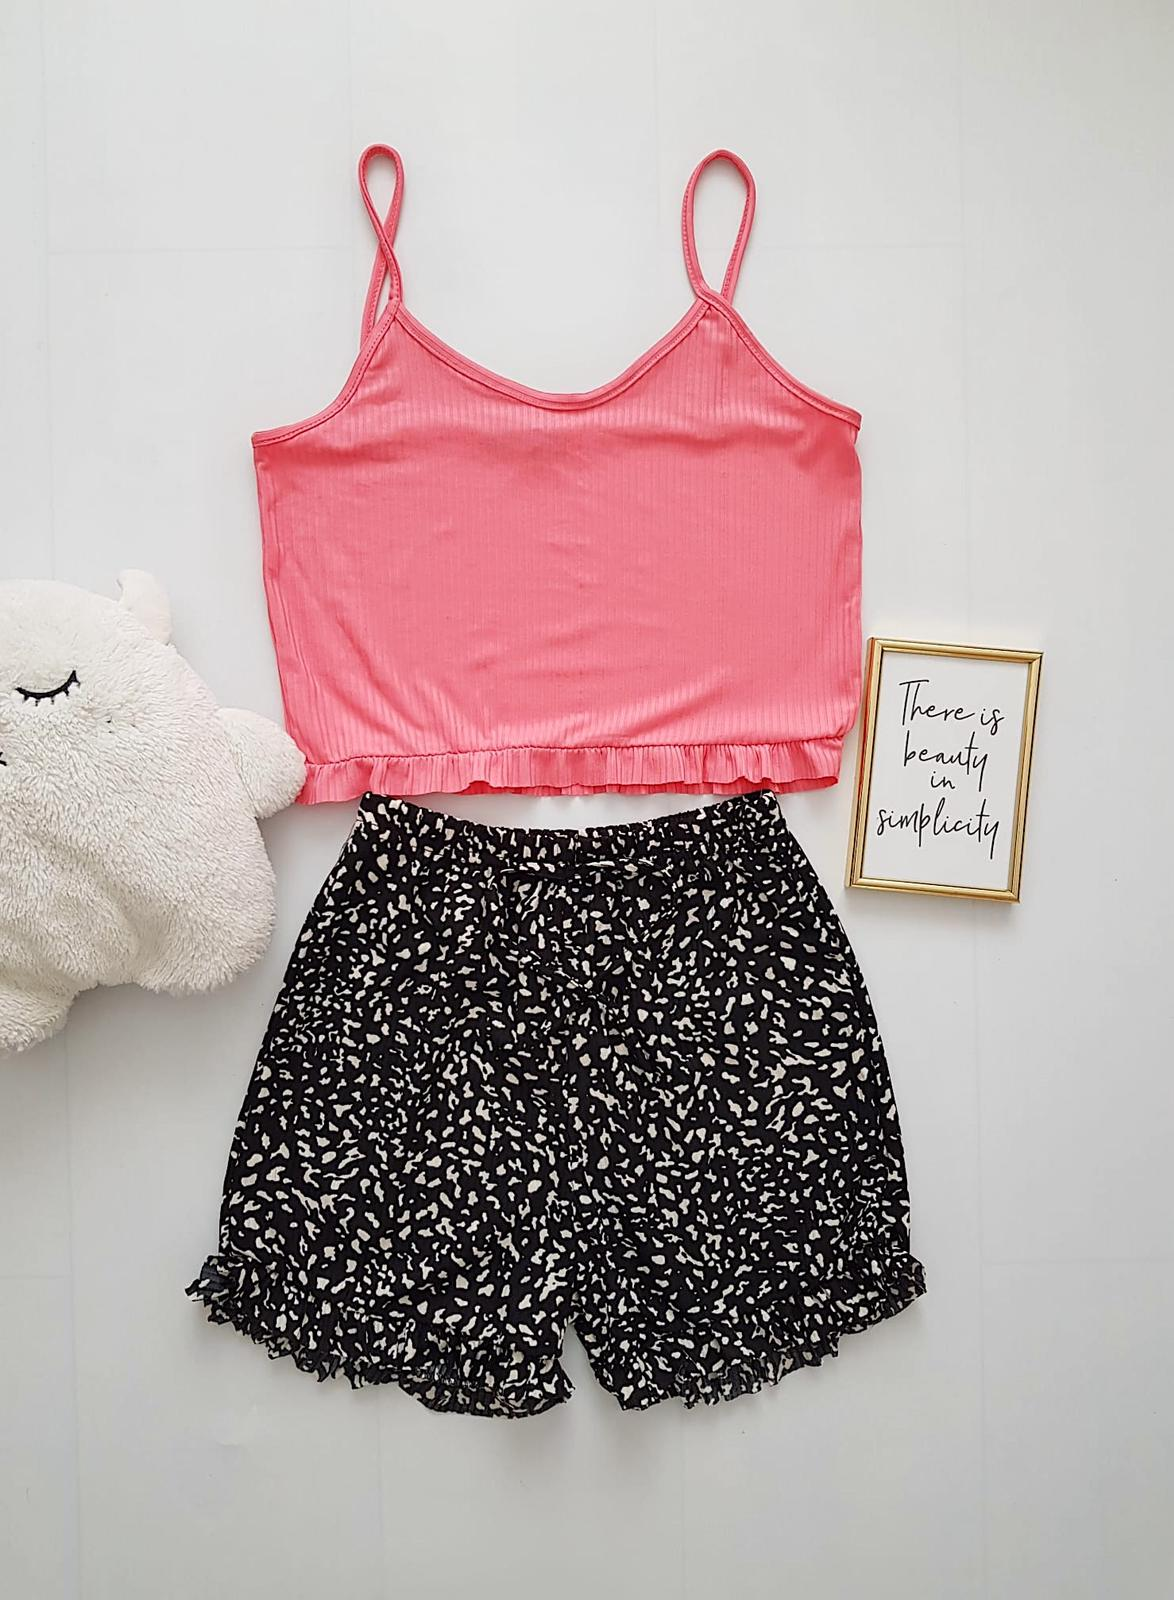 Pijama dama ieftina scurta cu maieu cu volanase Combo roz + drops negru